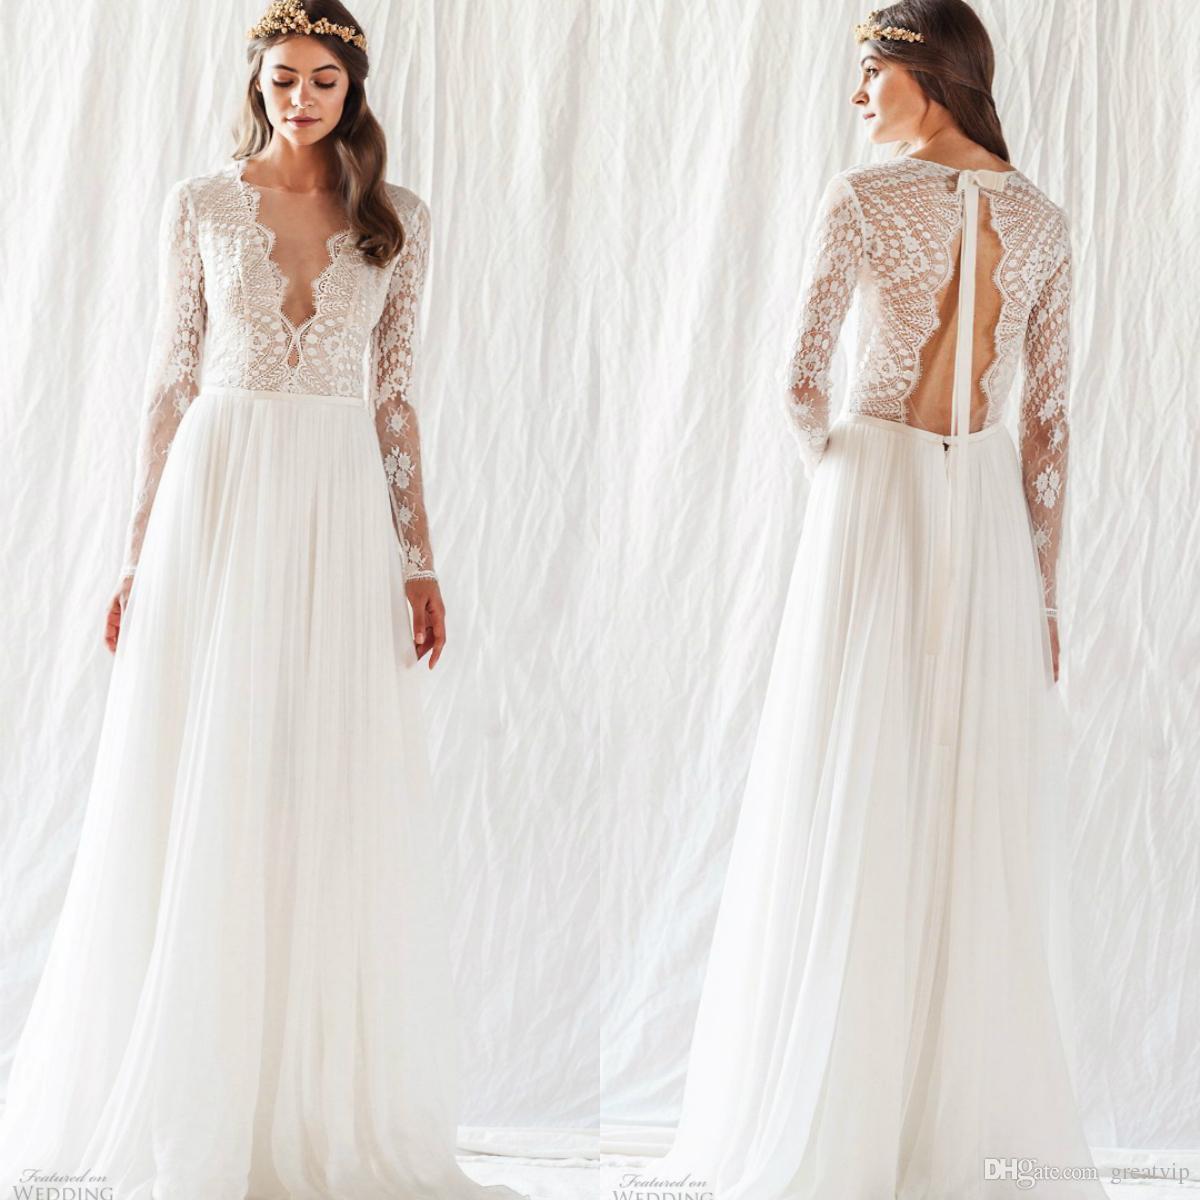 Atelier divino 2019 bohemia chiffon vestidos de casamento de manga longa rendas plus size vestidos de noiva personalizado praia boho vestidos de novia